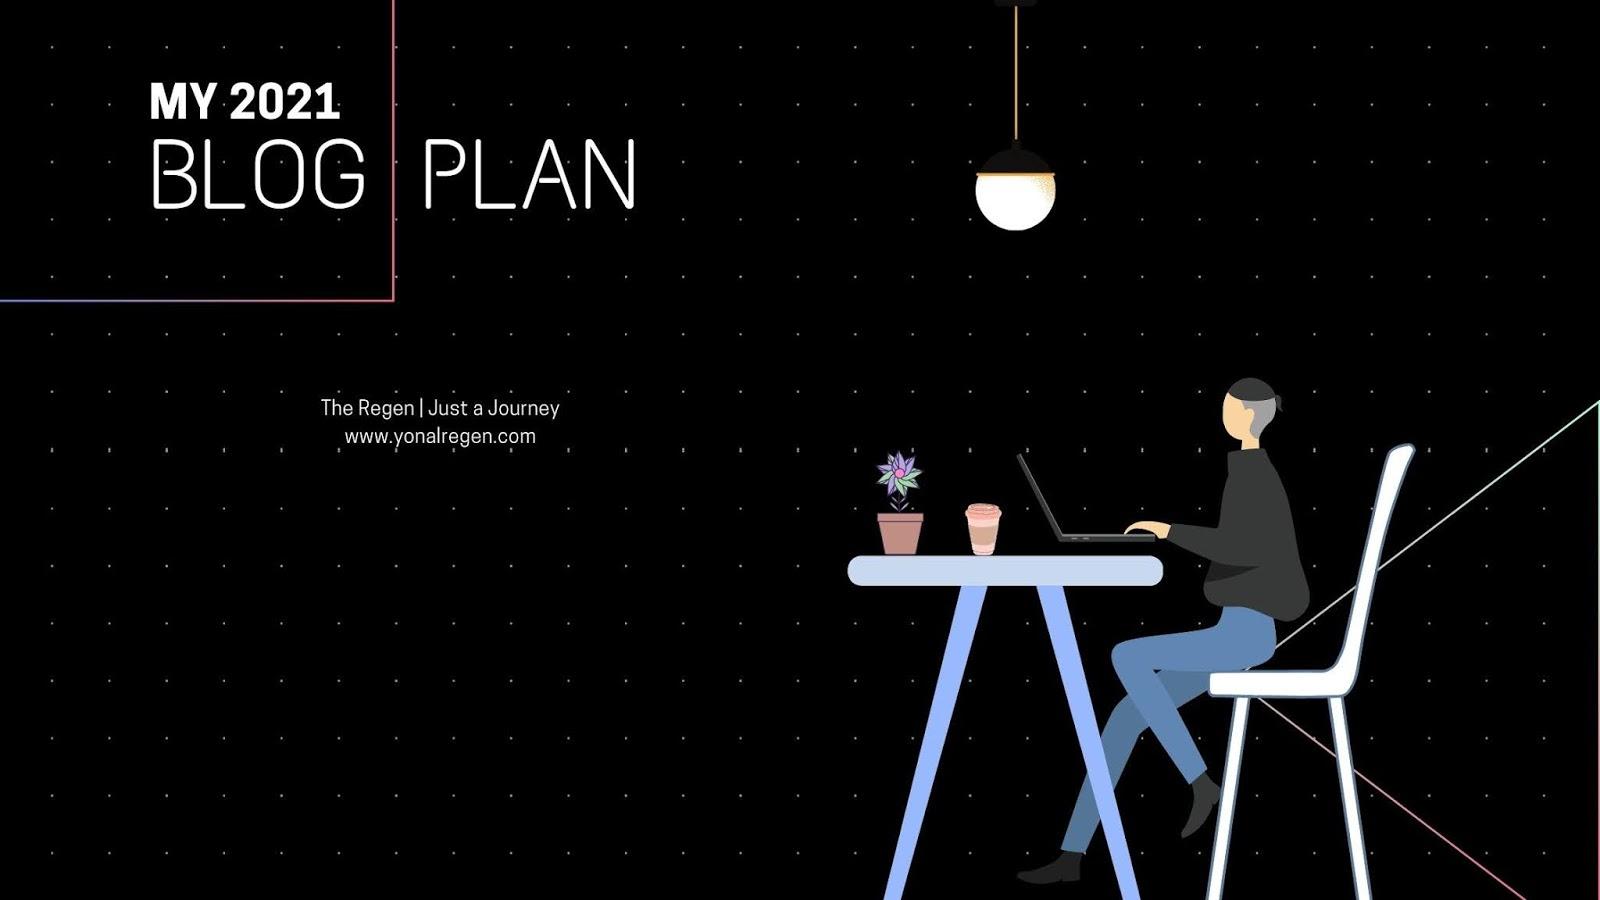 my 2021 blog plan